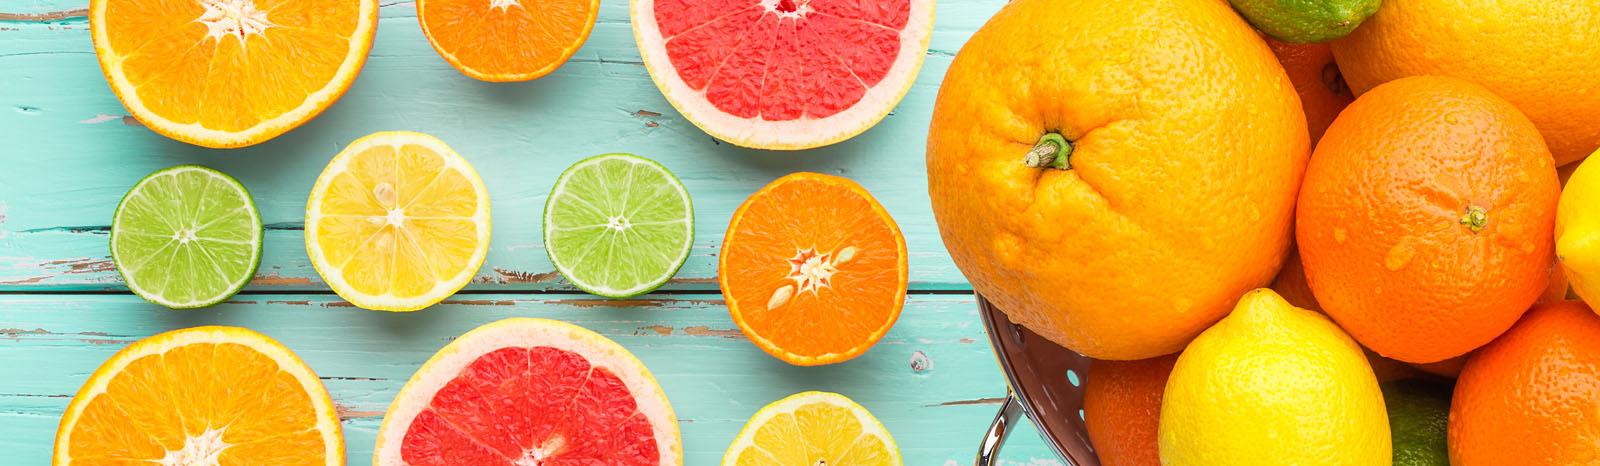 Pure hCG eat fresh natural fruit with an abundance of vitamin c